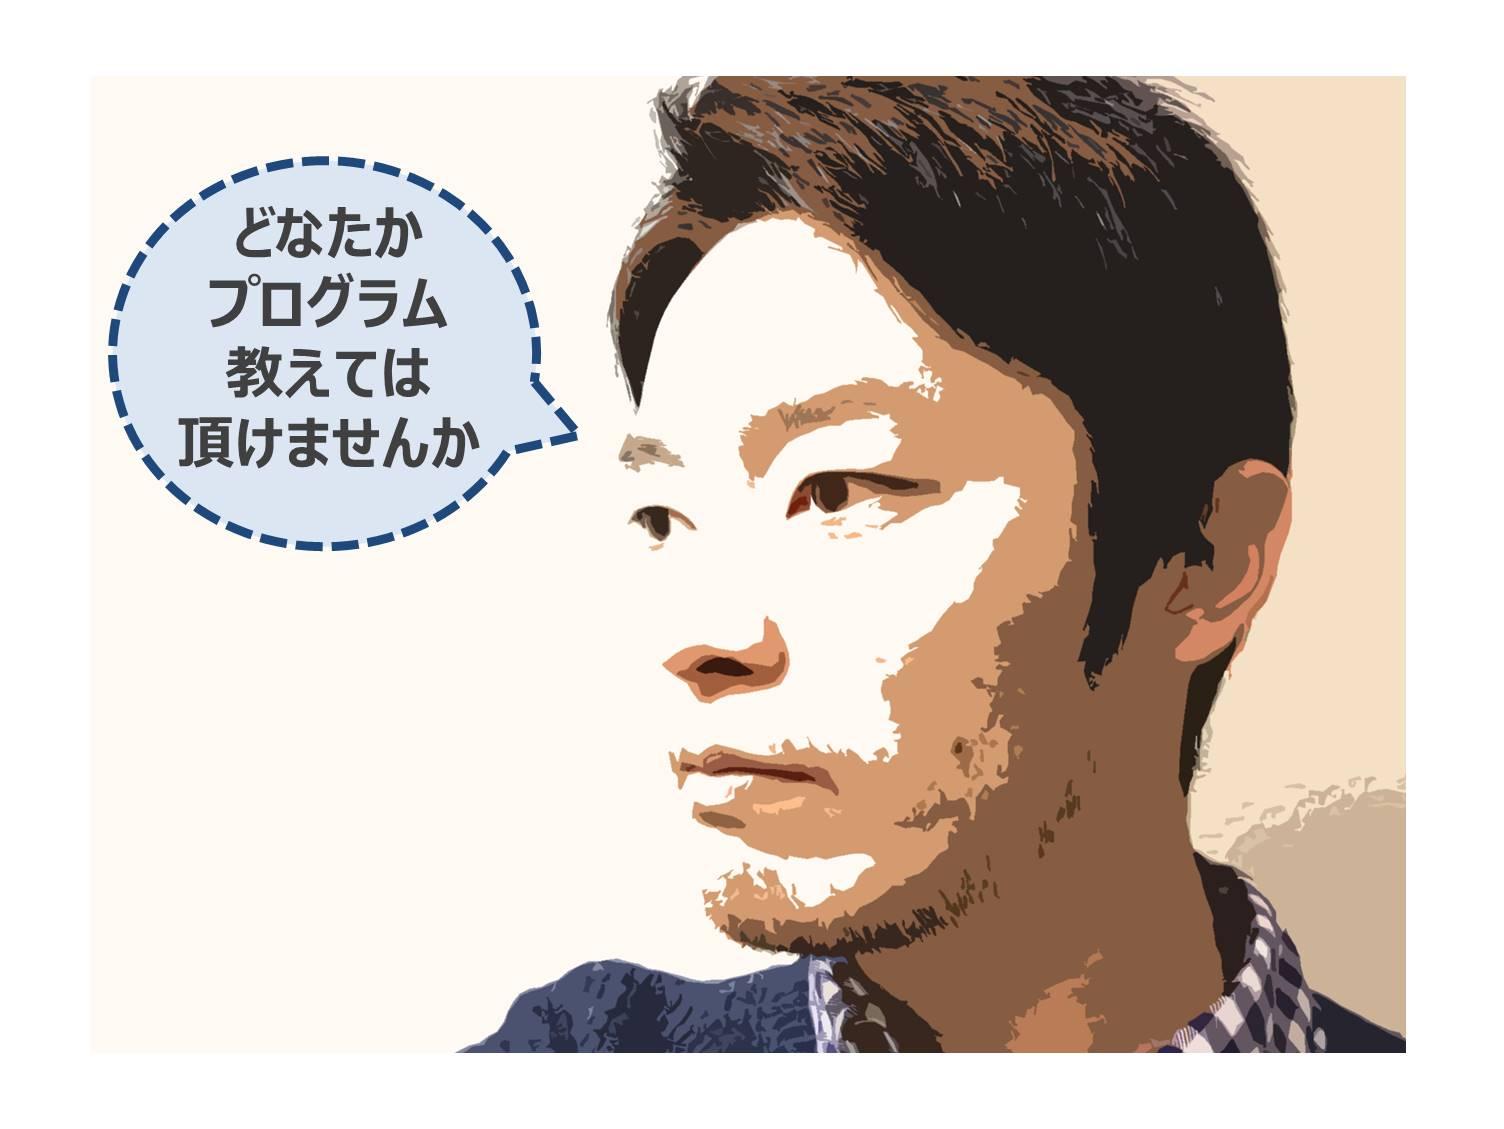 miyabi-program-eye